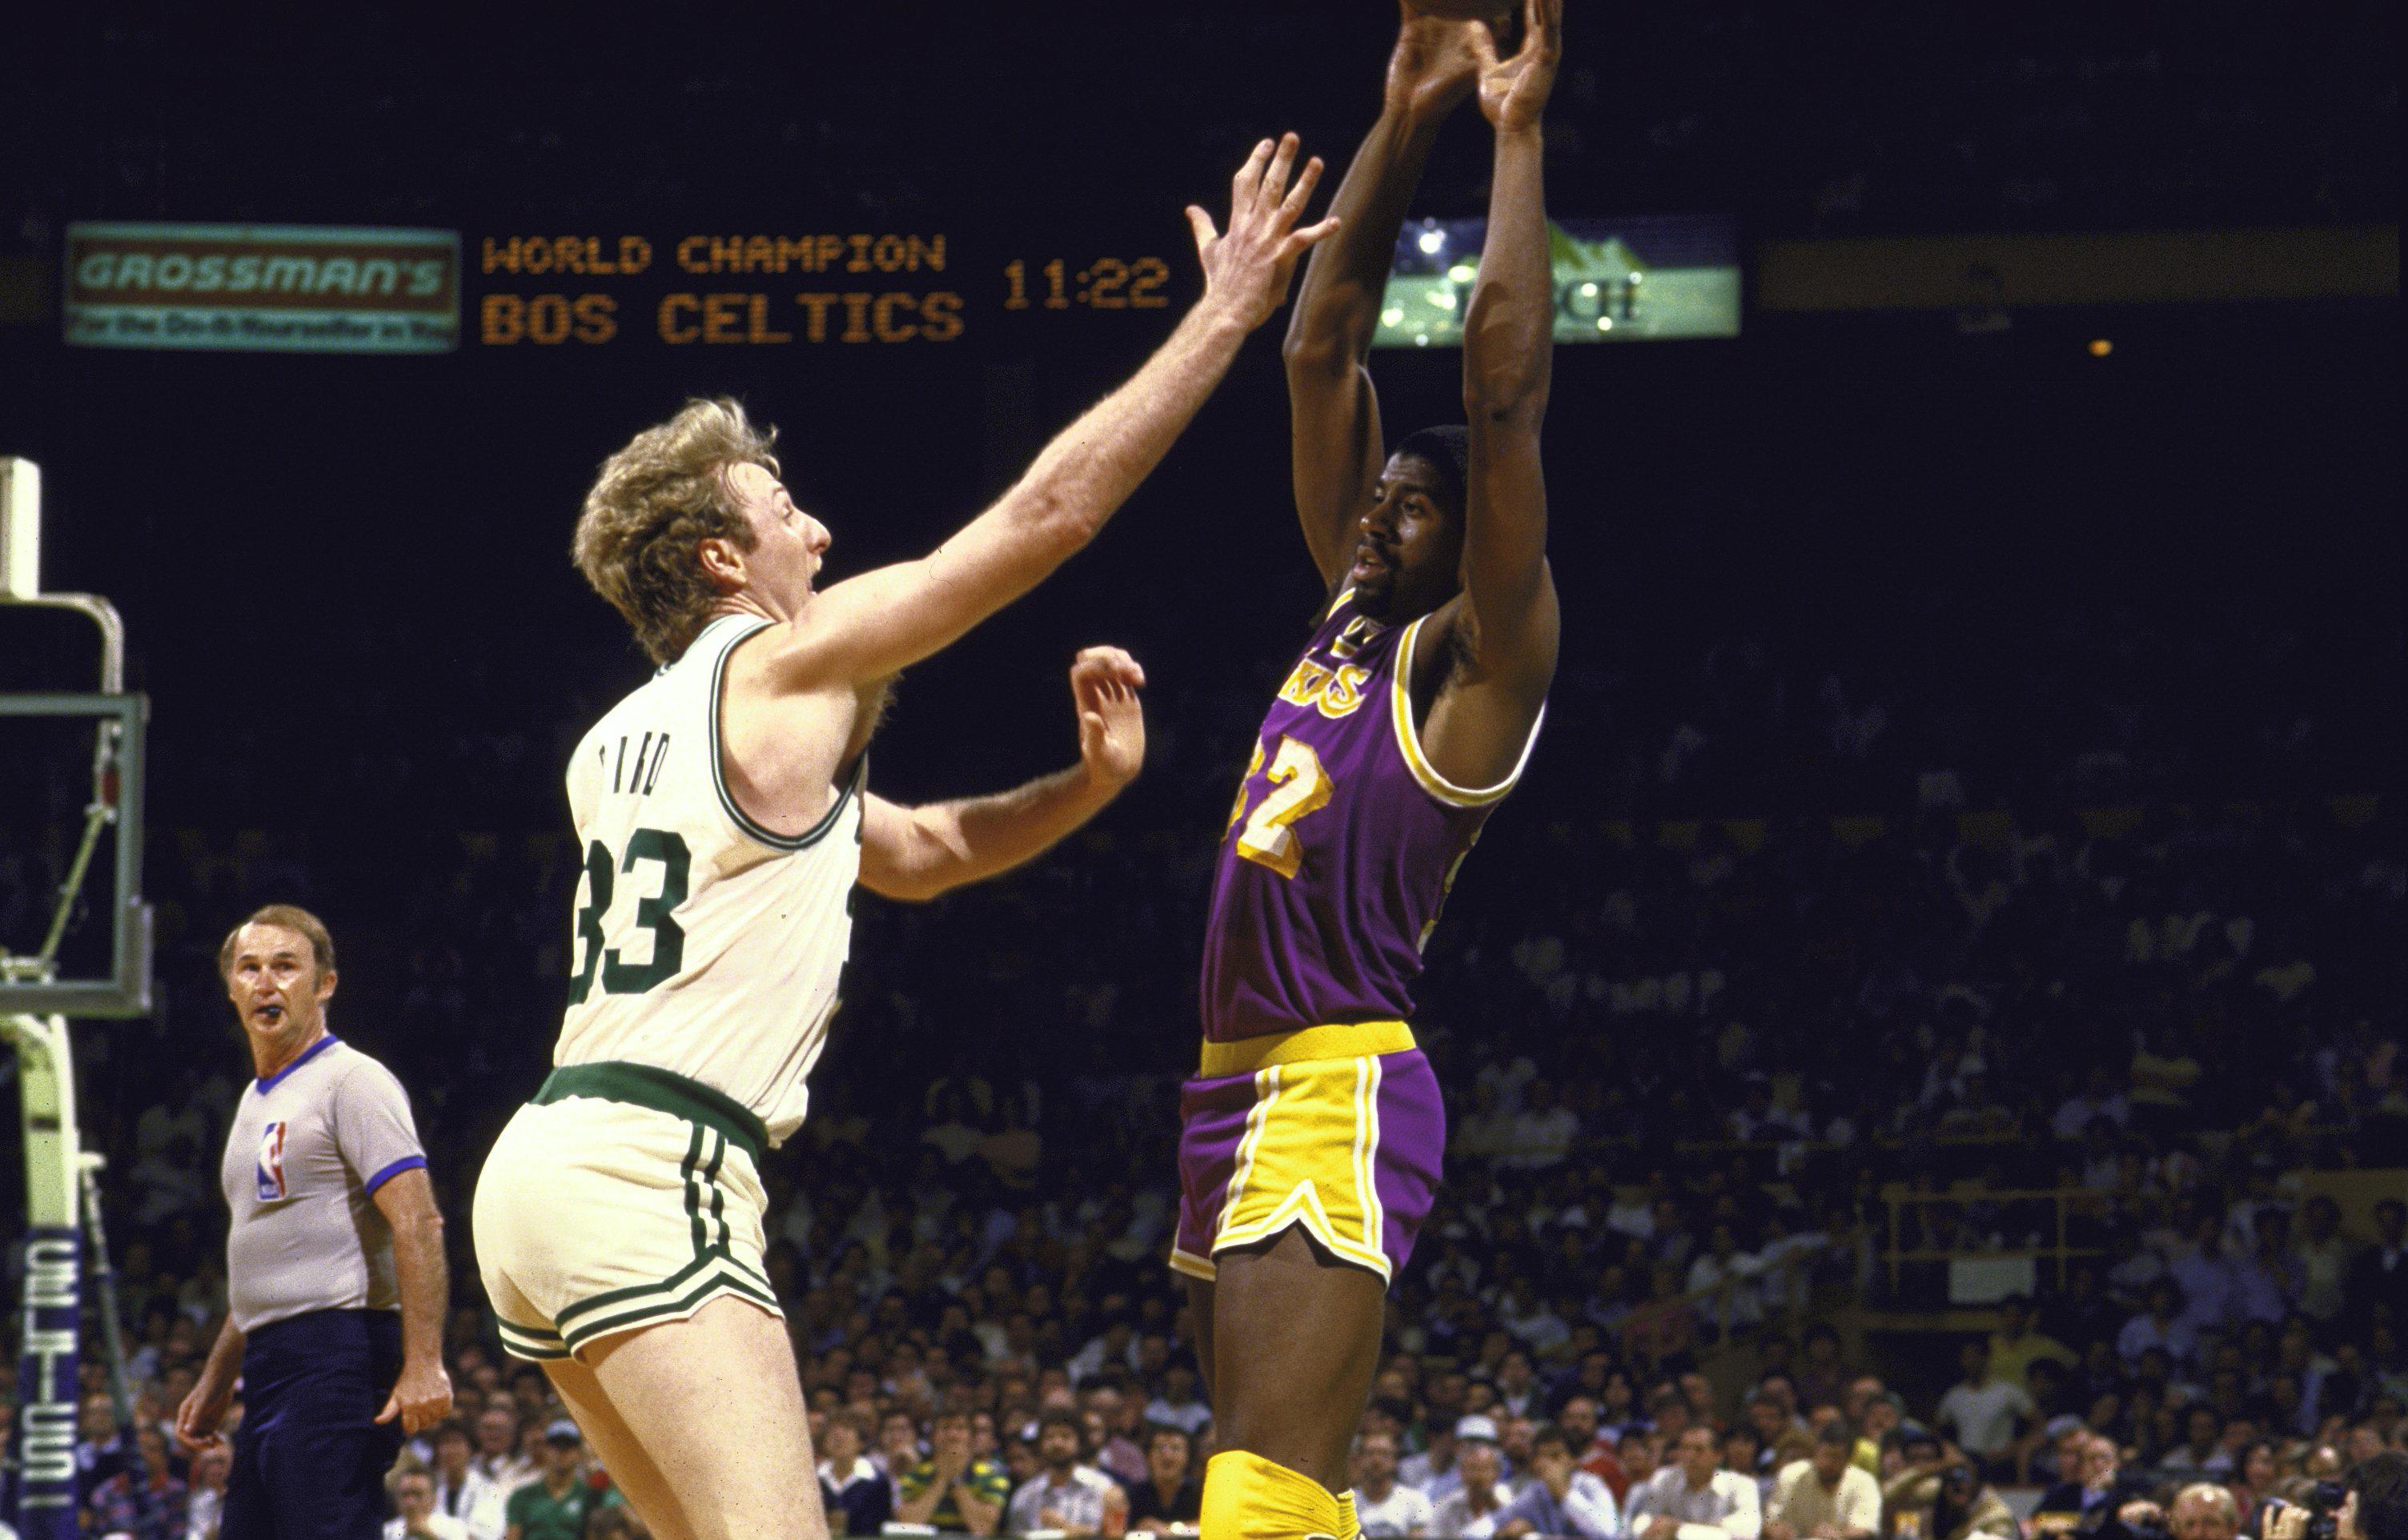 http://hoopshabit.com/wp-content/uploads/getty-images/2016/03/117163096-boston-celtics-vs-los-angeles-lakers-1985-nba-finals.jpg